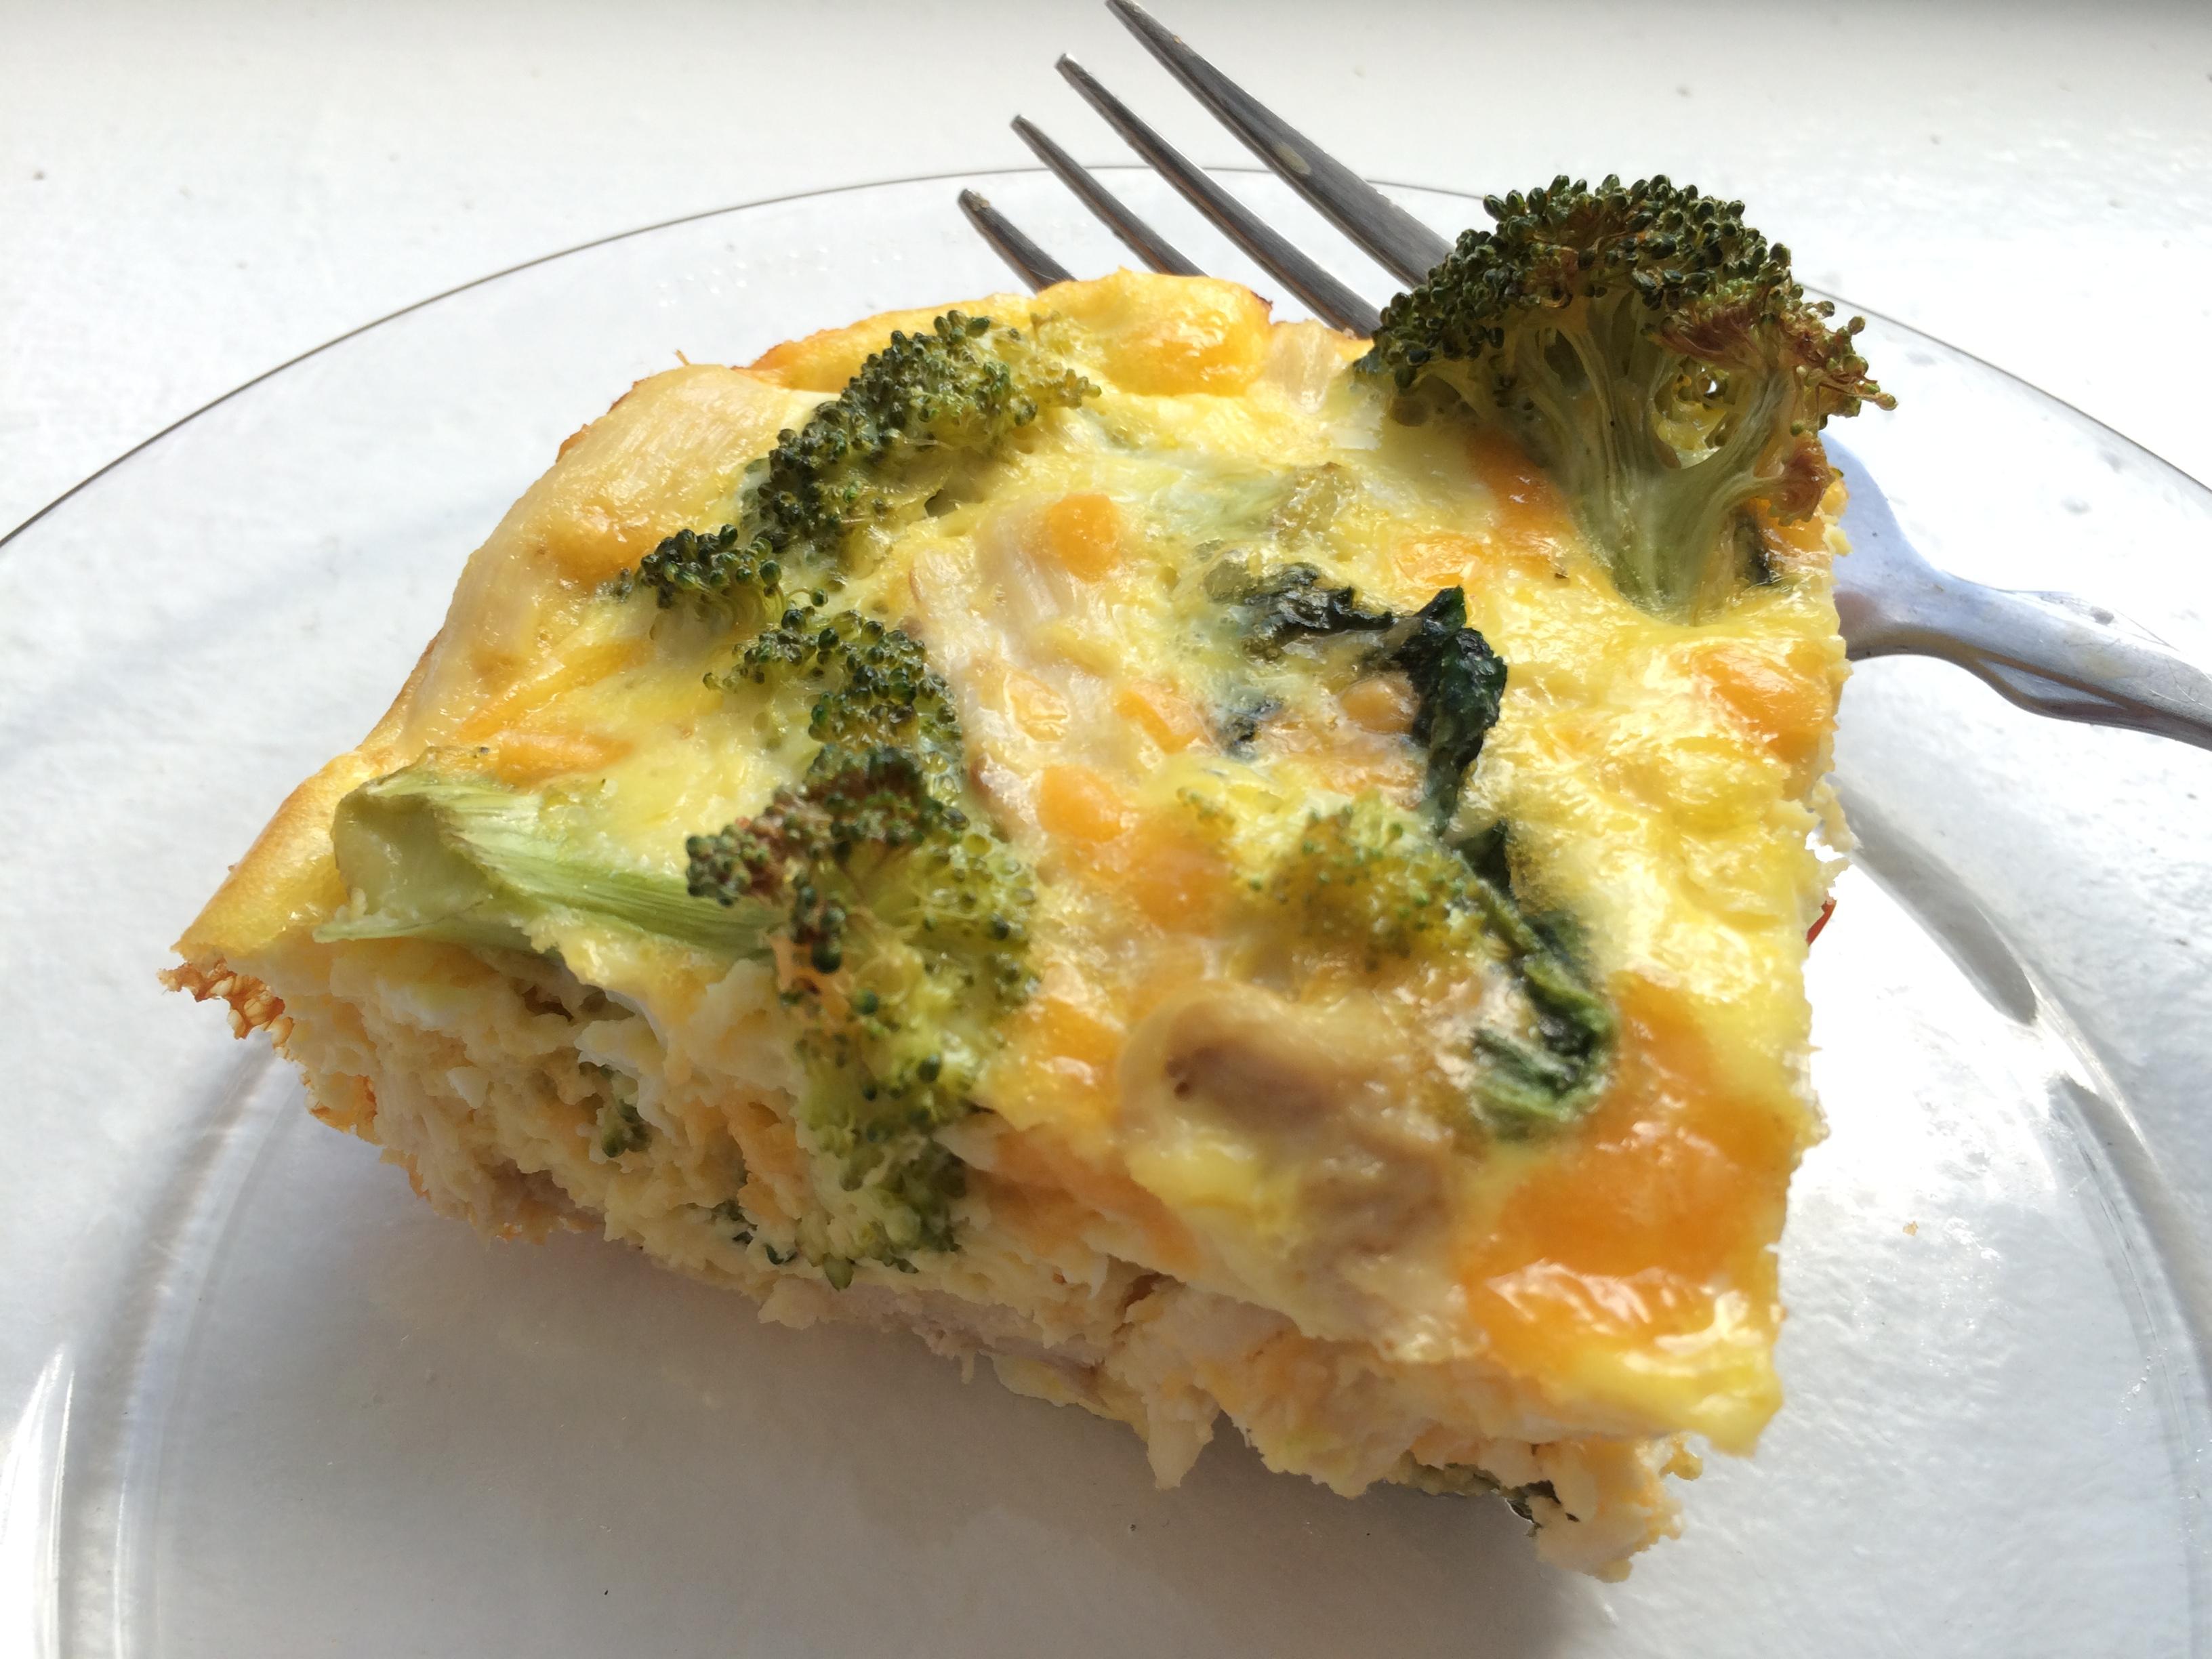 Broccoli chicken and cheese frittata and a dash of cinnamon